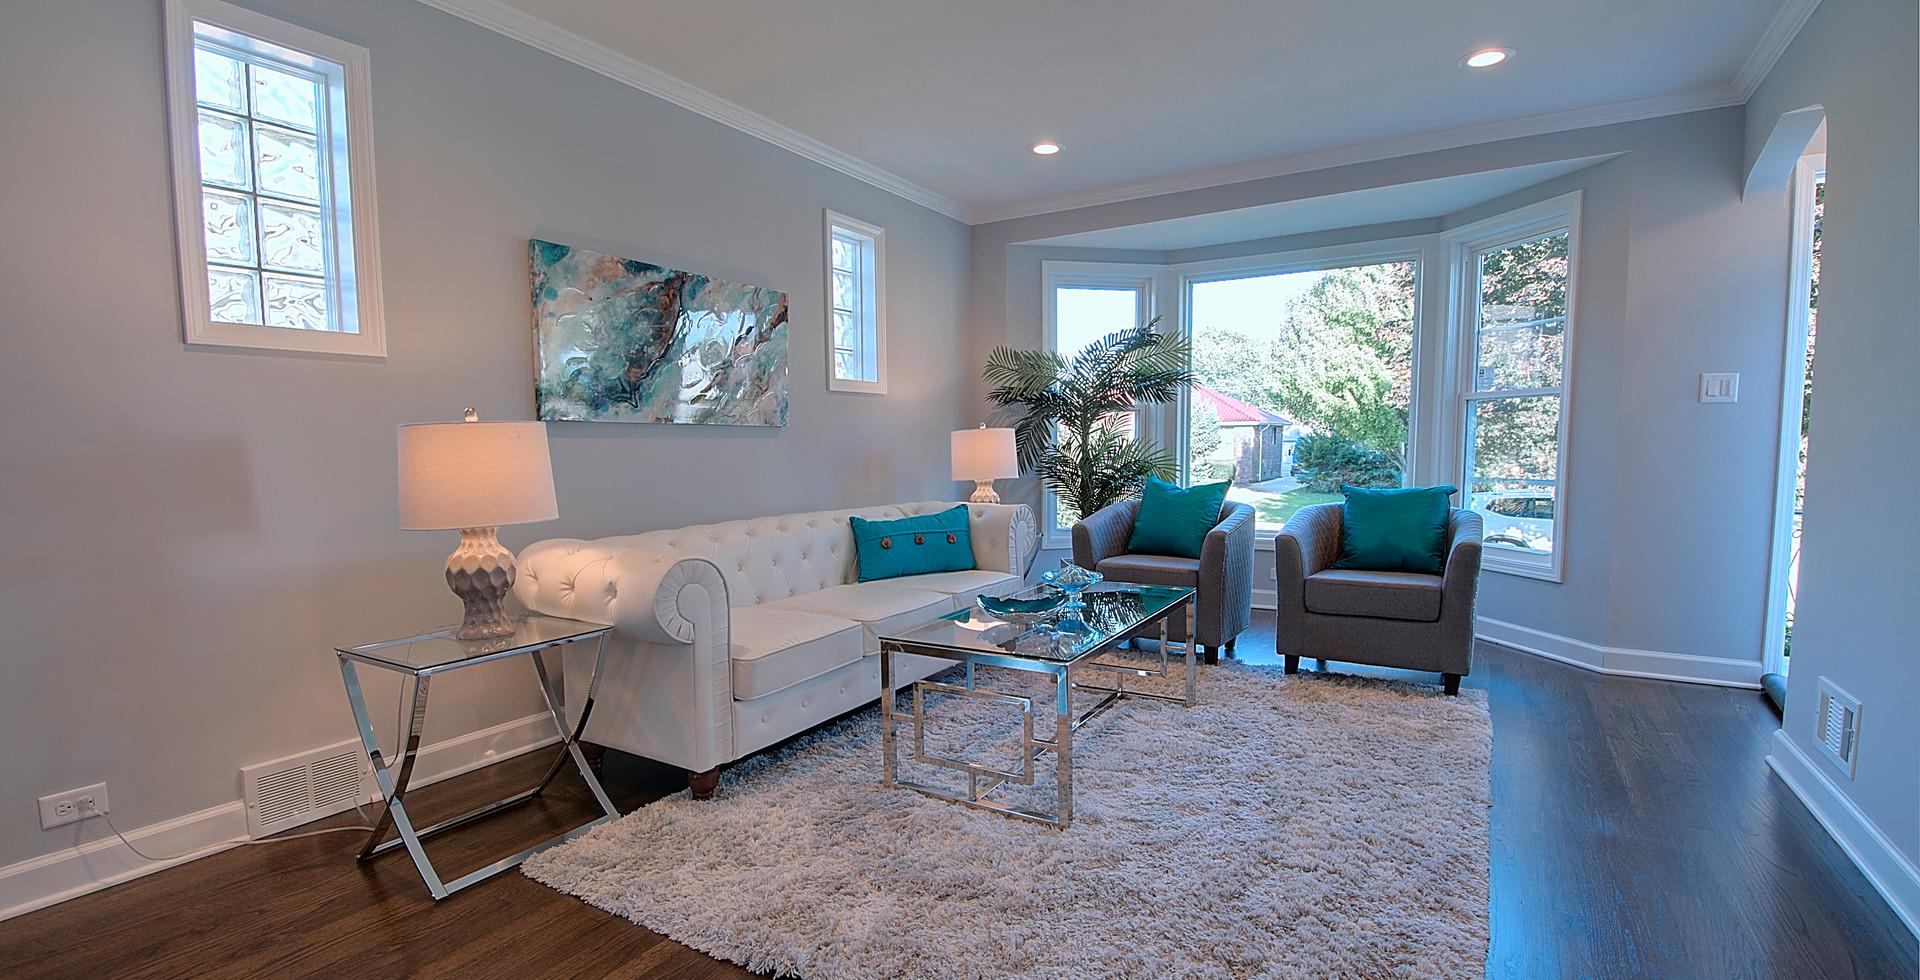 Living Room in Westmont designed by MRM Home Design.jpg